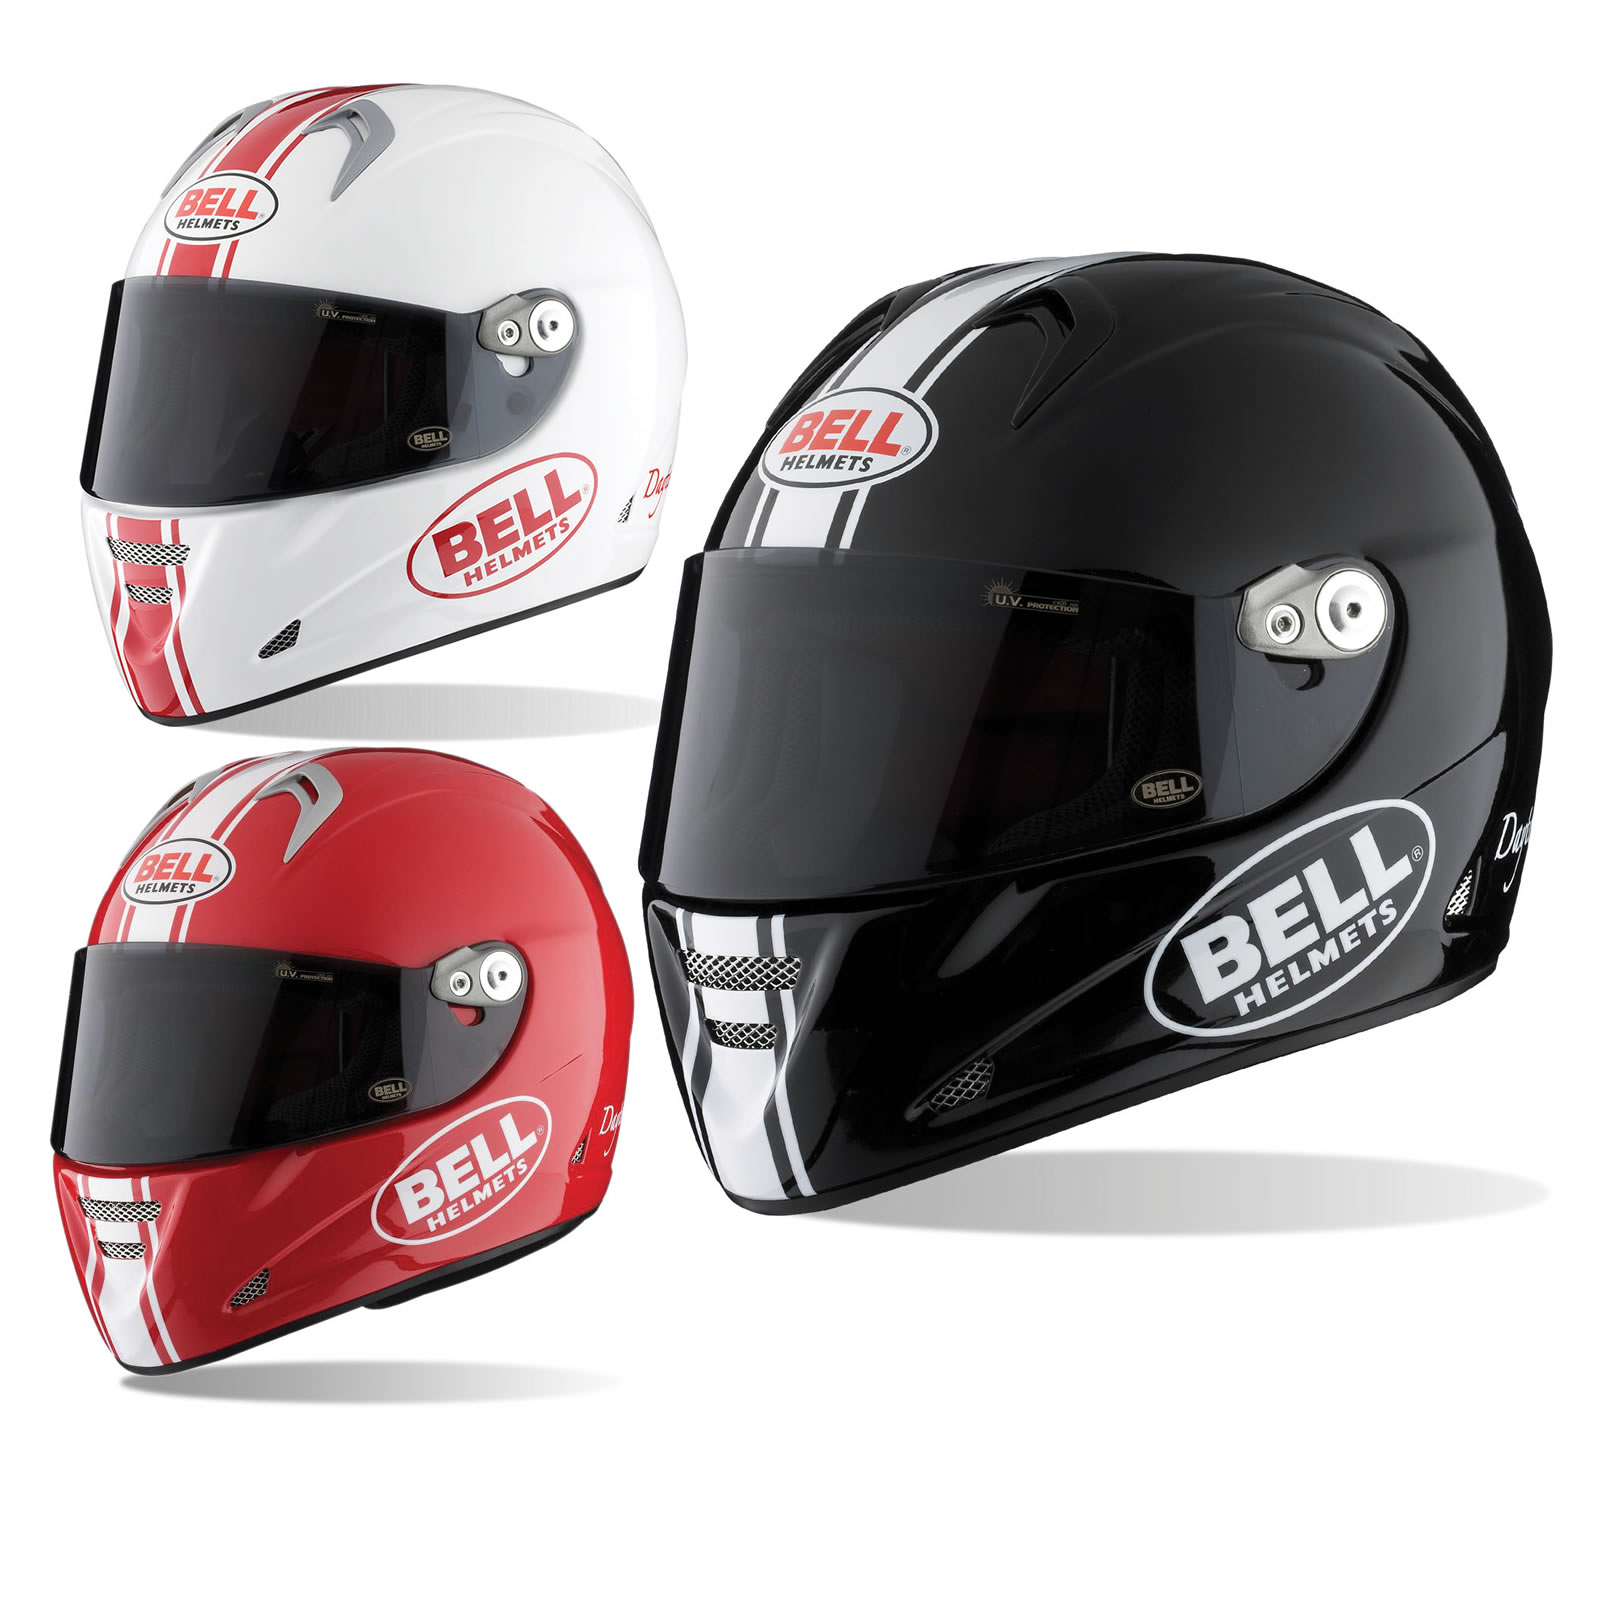 bell m5x daytona graphic motorcycle helmet full face. Black Bedroom Furniture Sets. Home Design Ideas